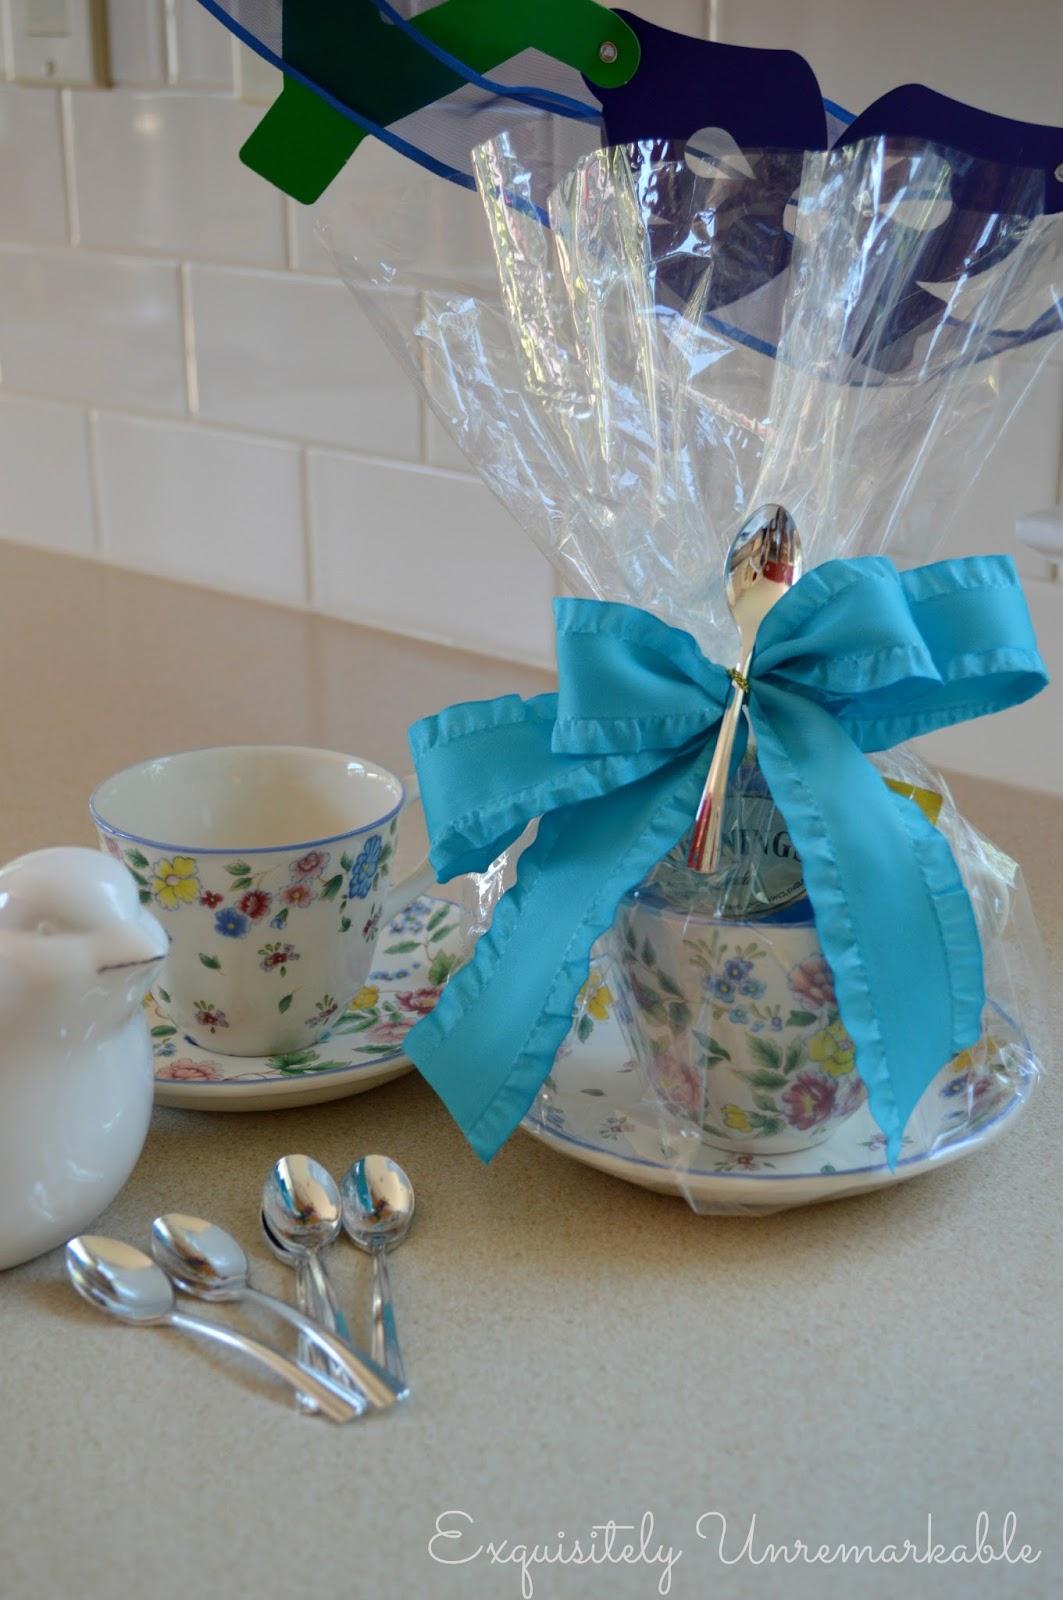 Tea cup party favor exquisitely unremarkable for Teacup party favors